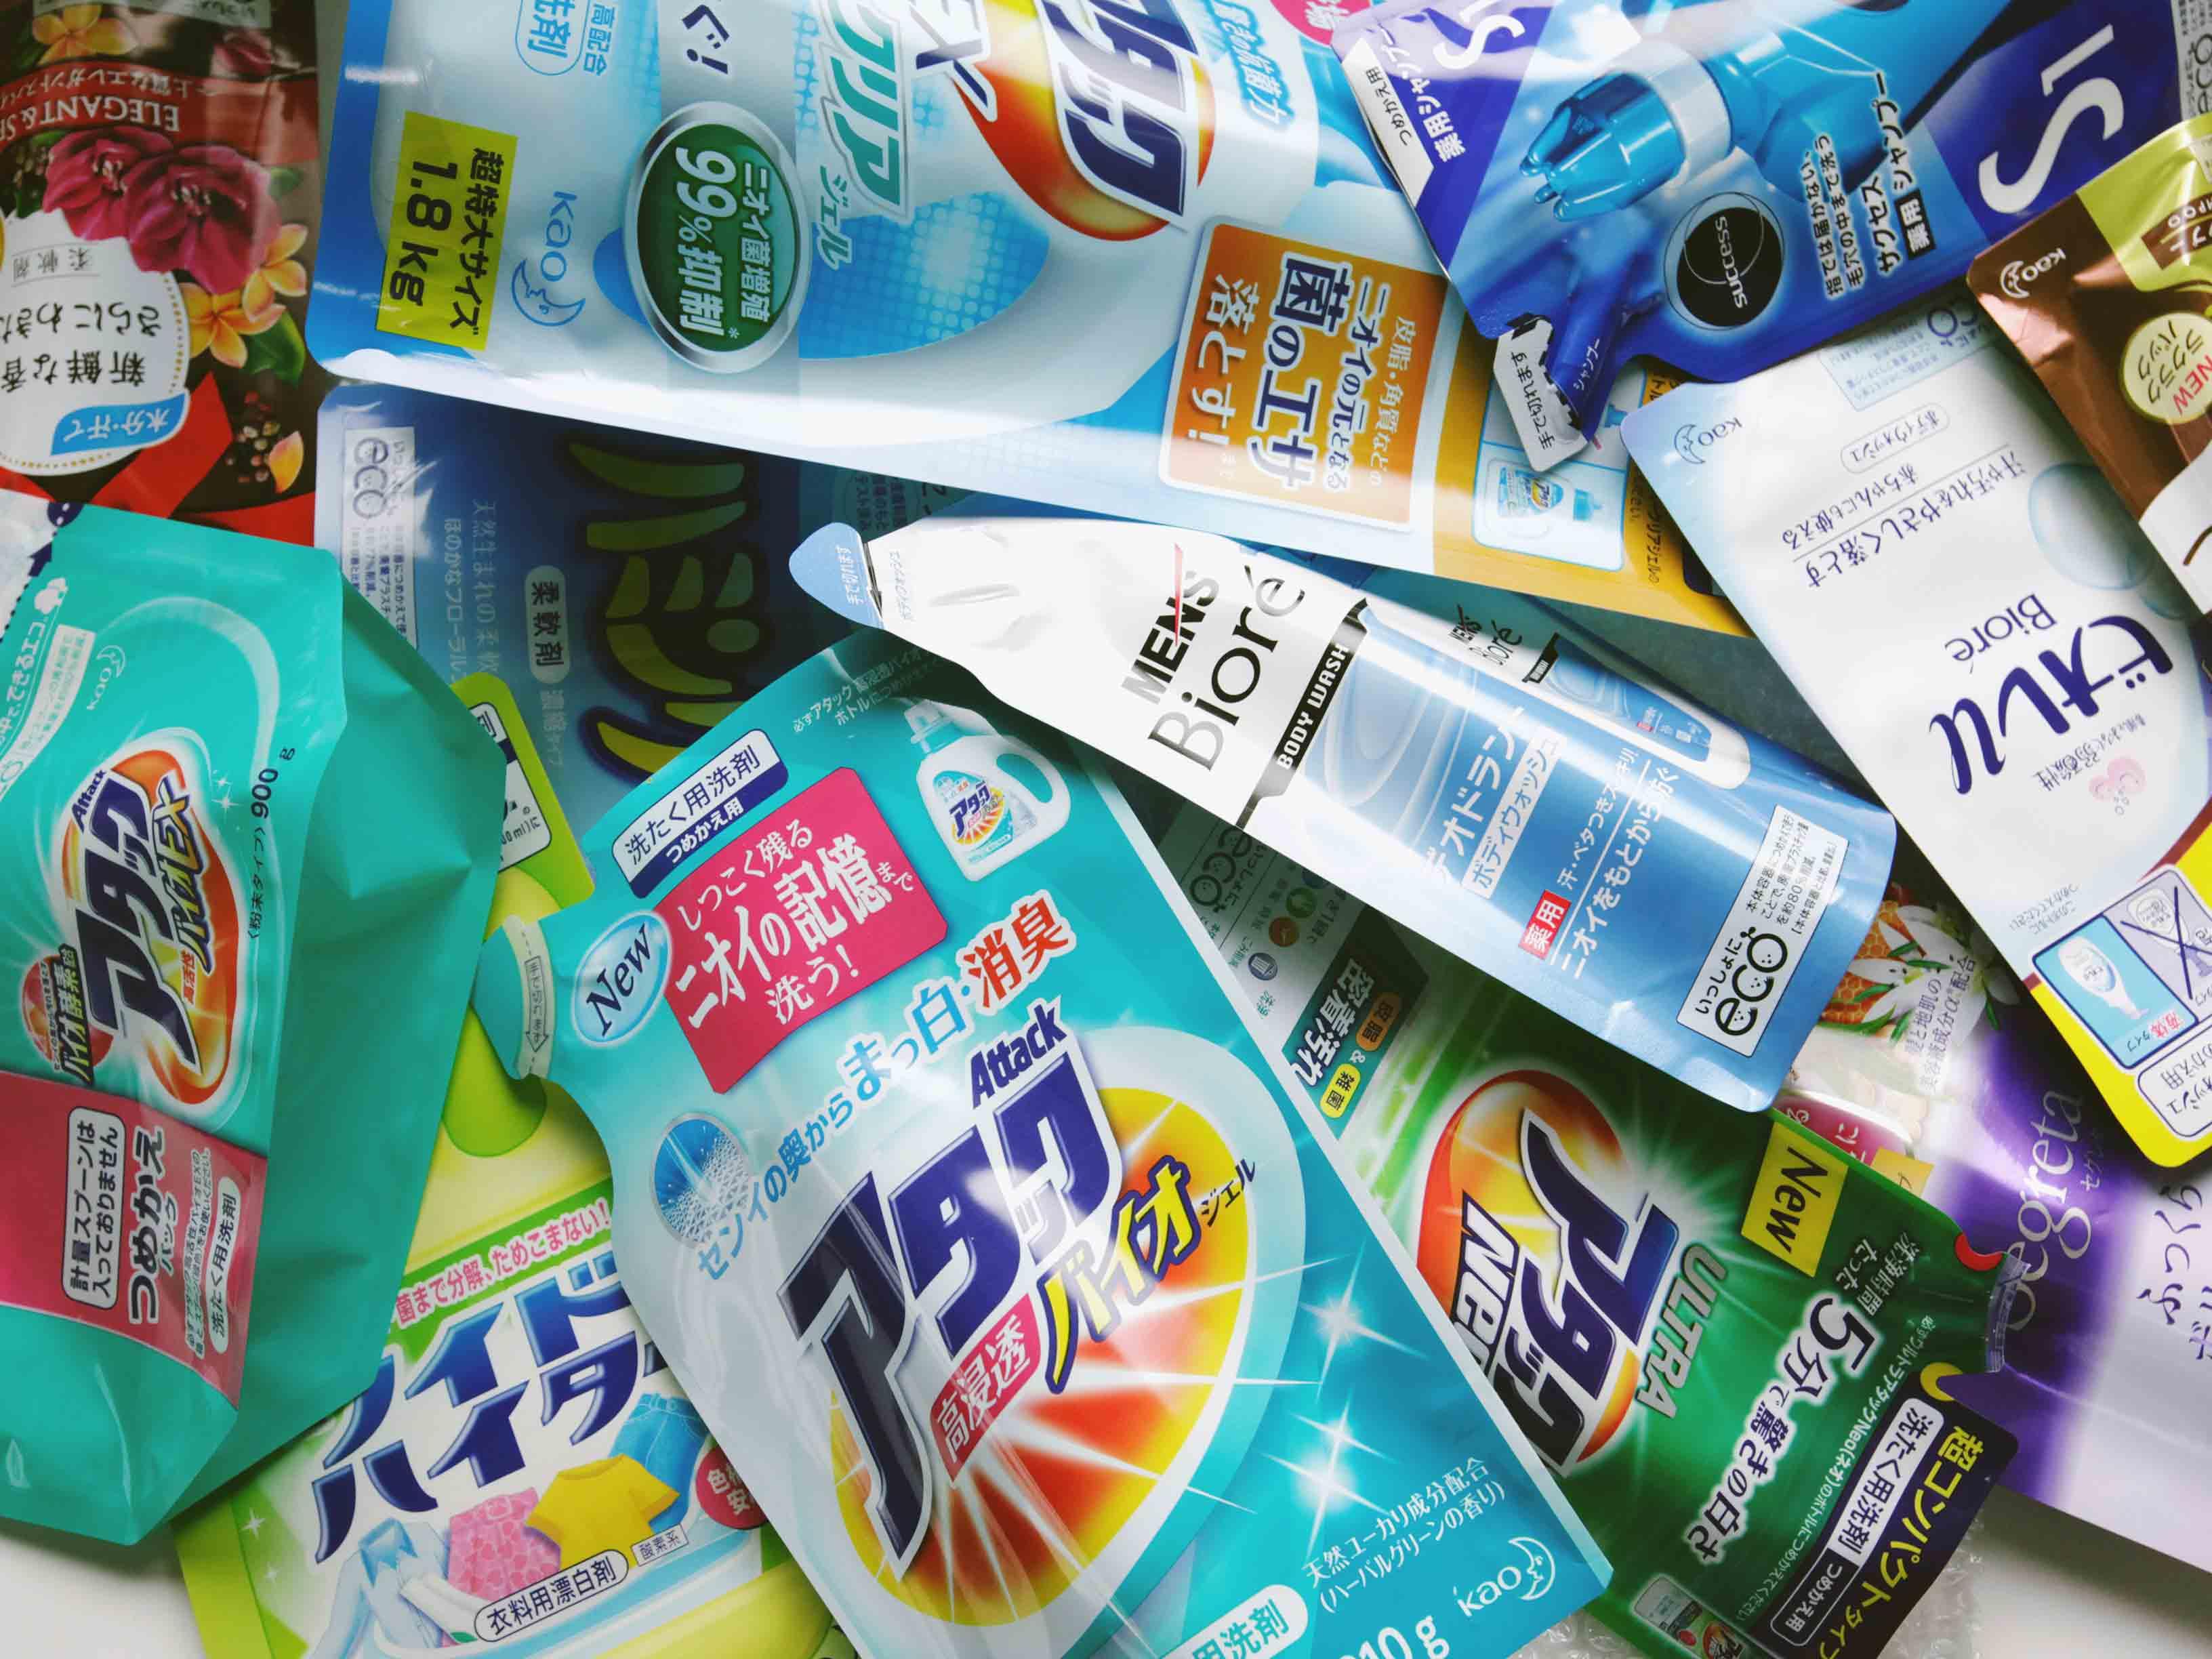 Thumbnail for 清潔製品つめかえパックリサイクル